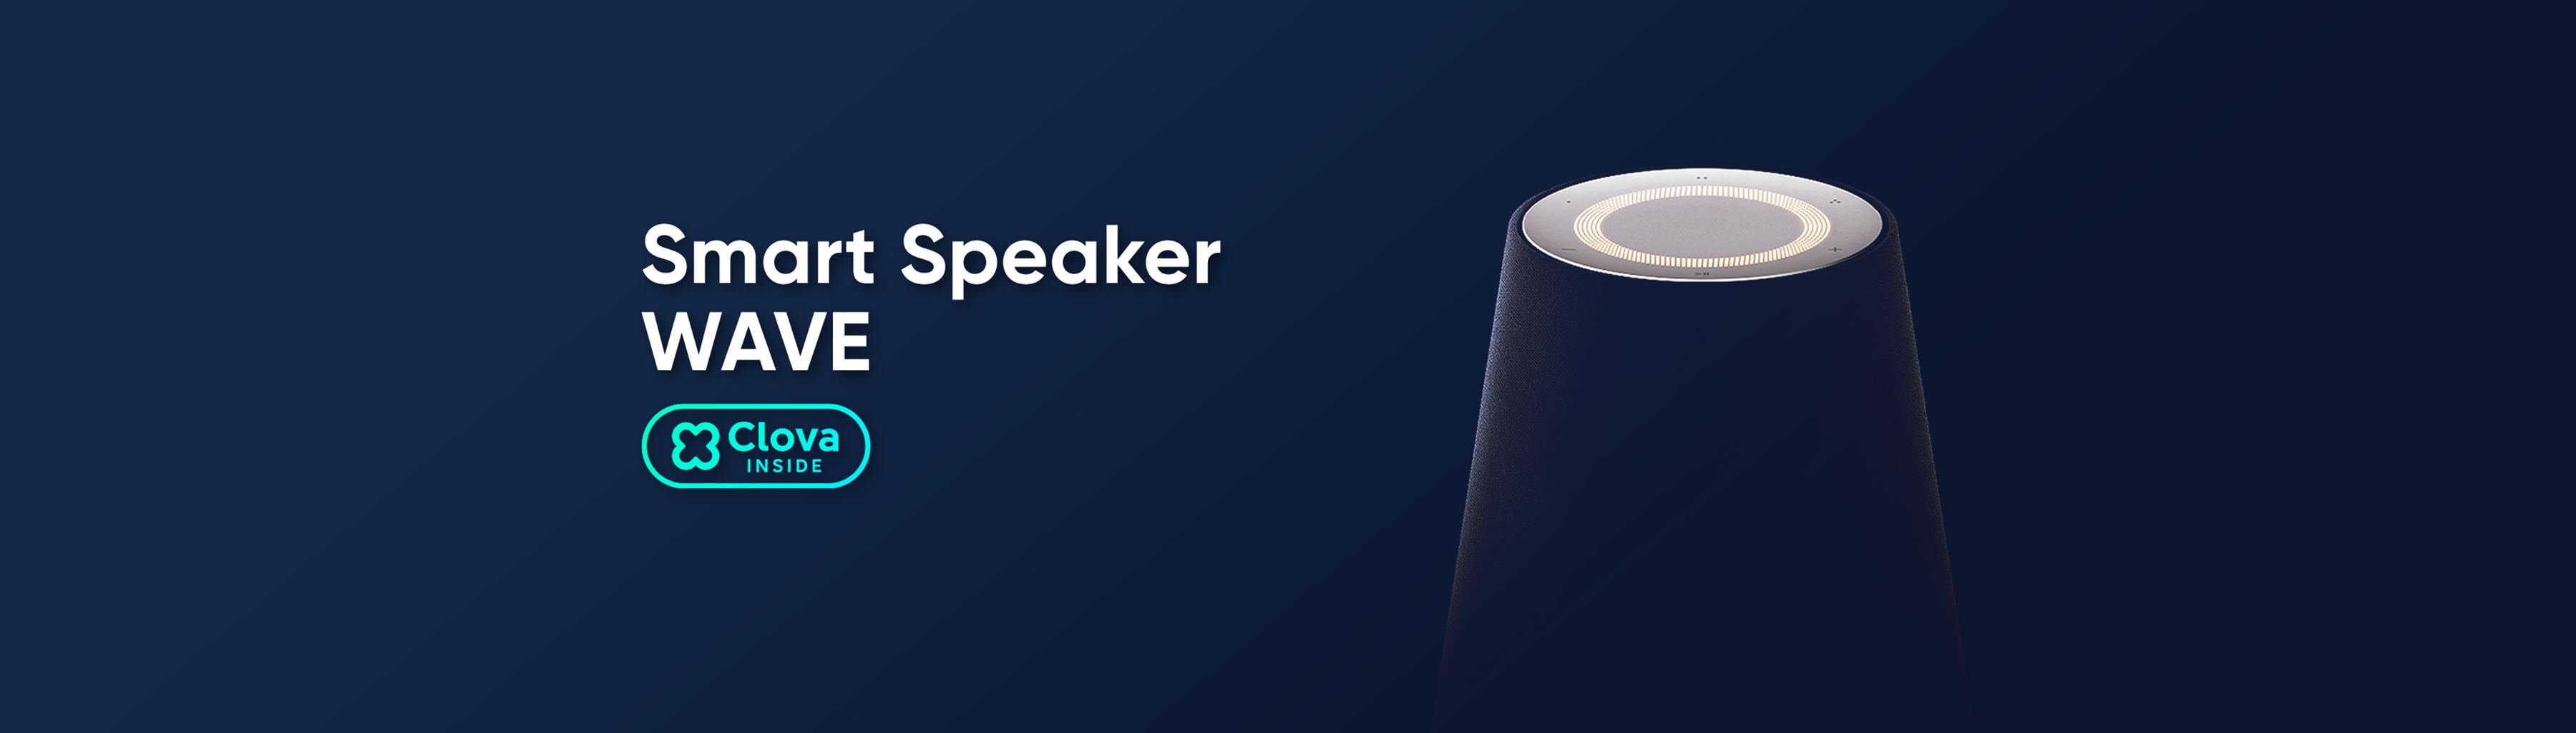 Smart Speaker Wave